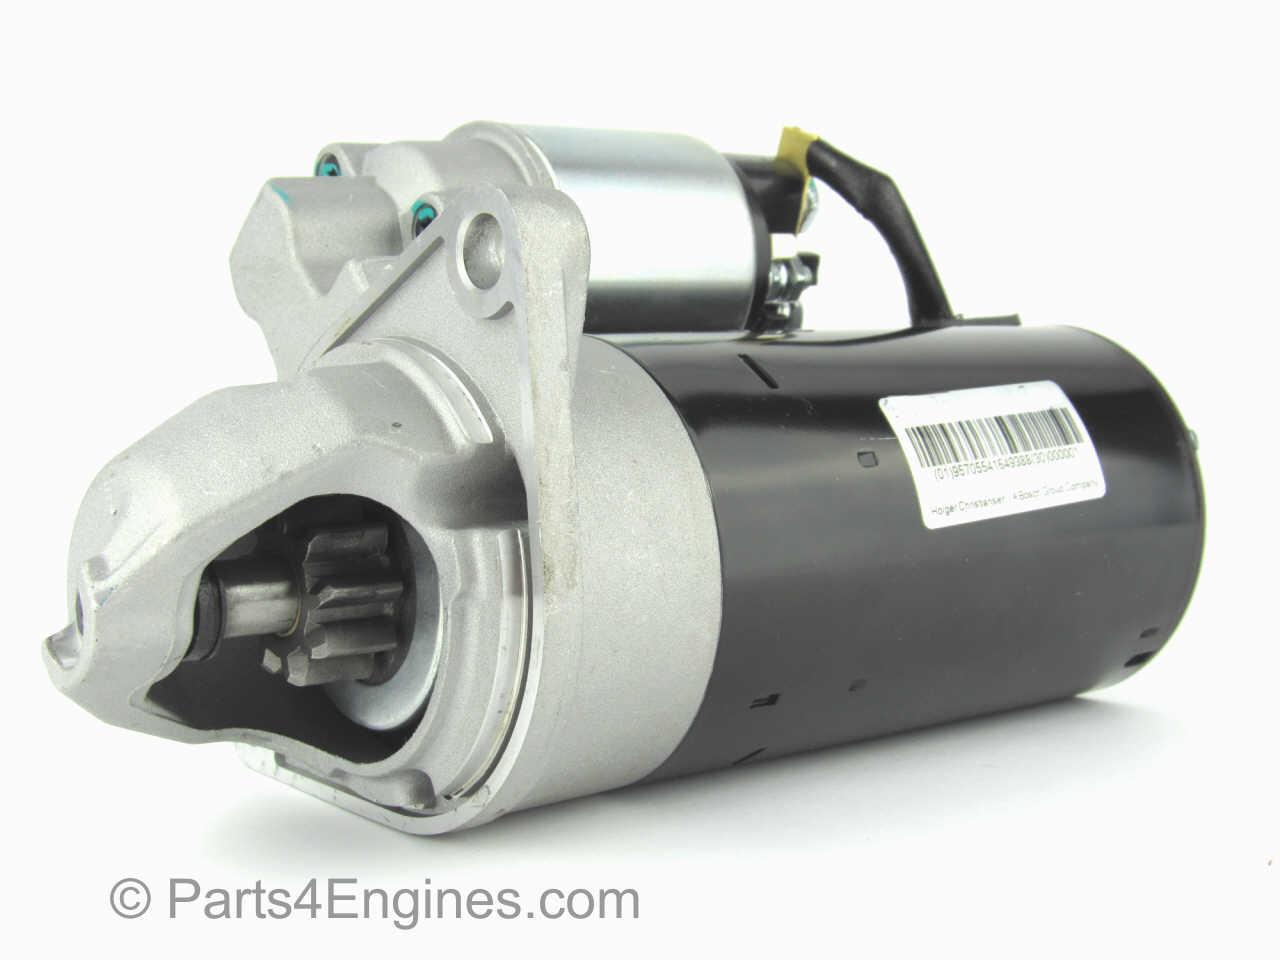 Perkins Perama M25 Starter Motor - parts4engines.com